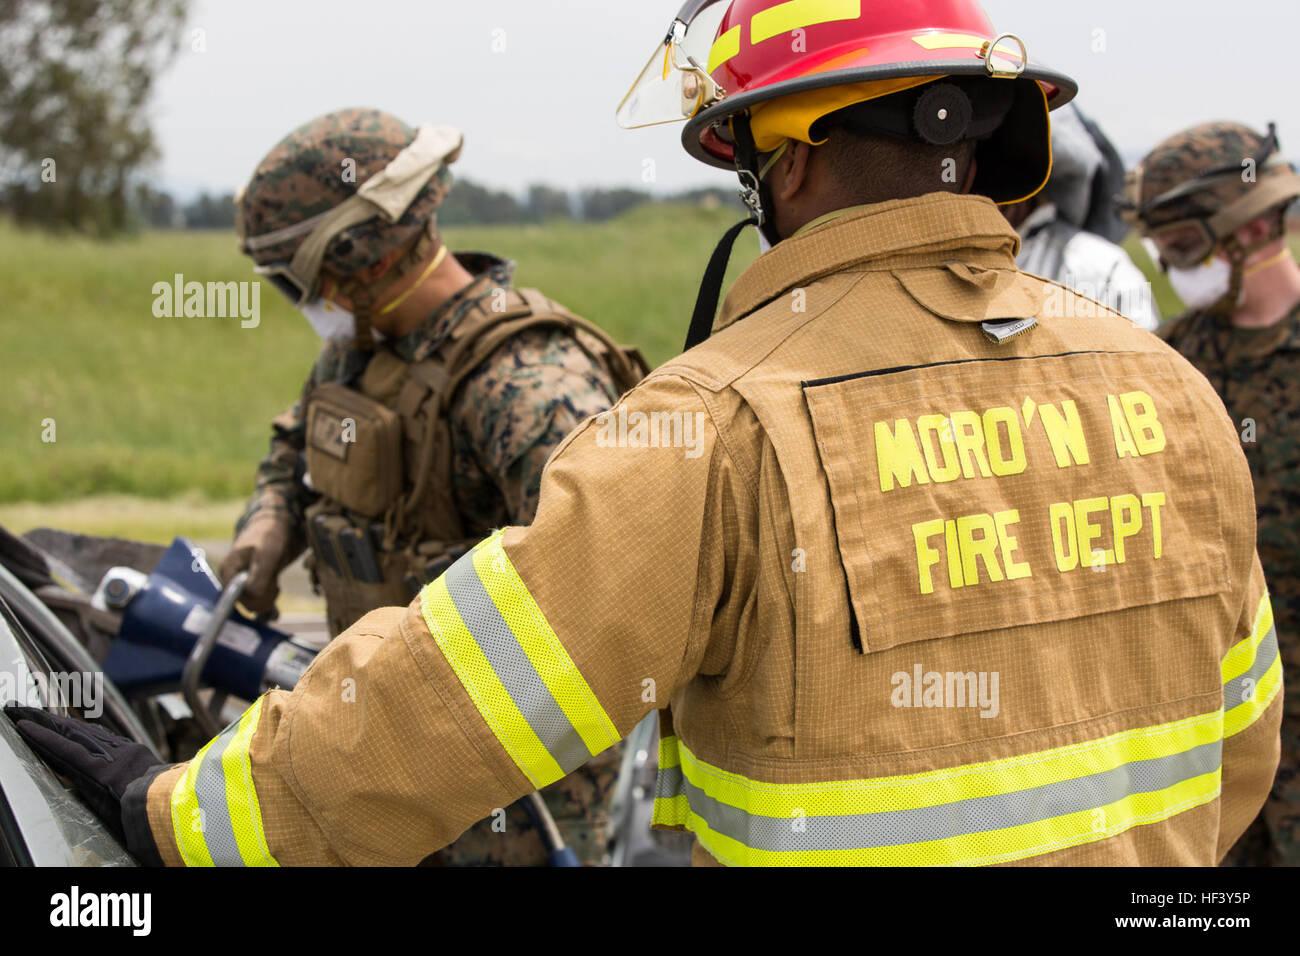 marine corps firefighter